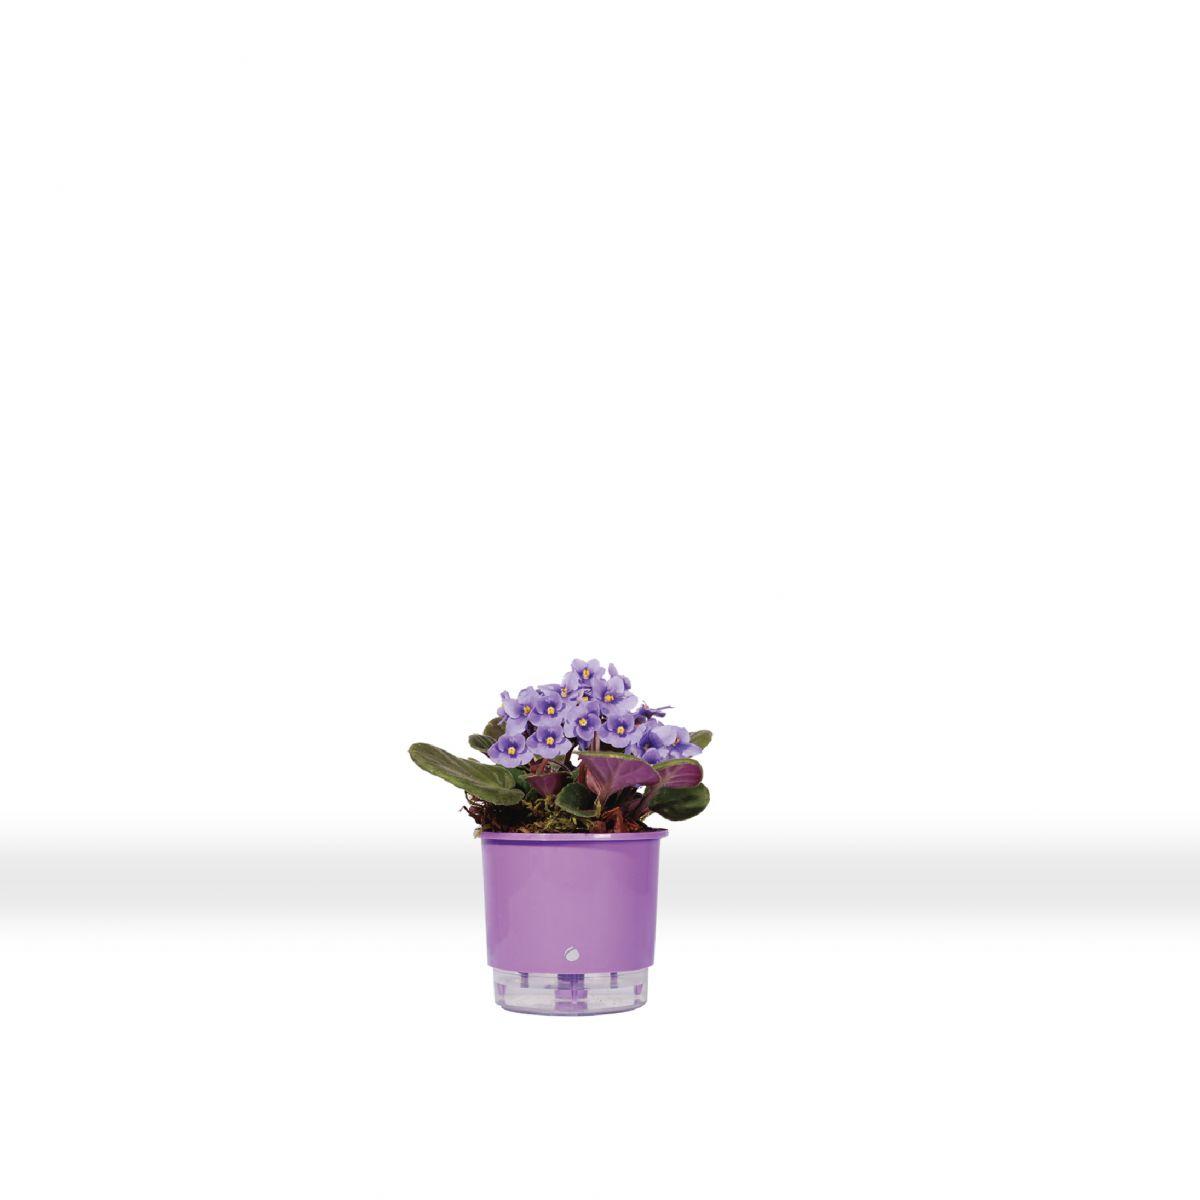 Vaso autoirrigável Raiz MINI 10,5 cm X 9 cm